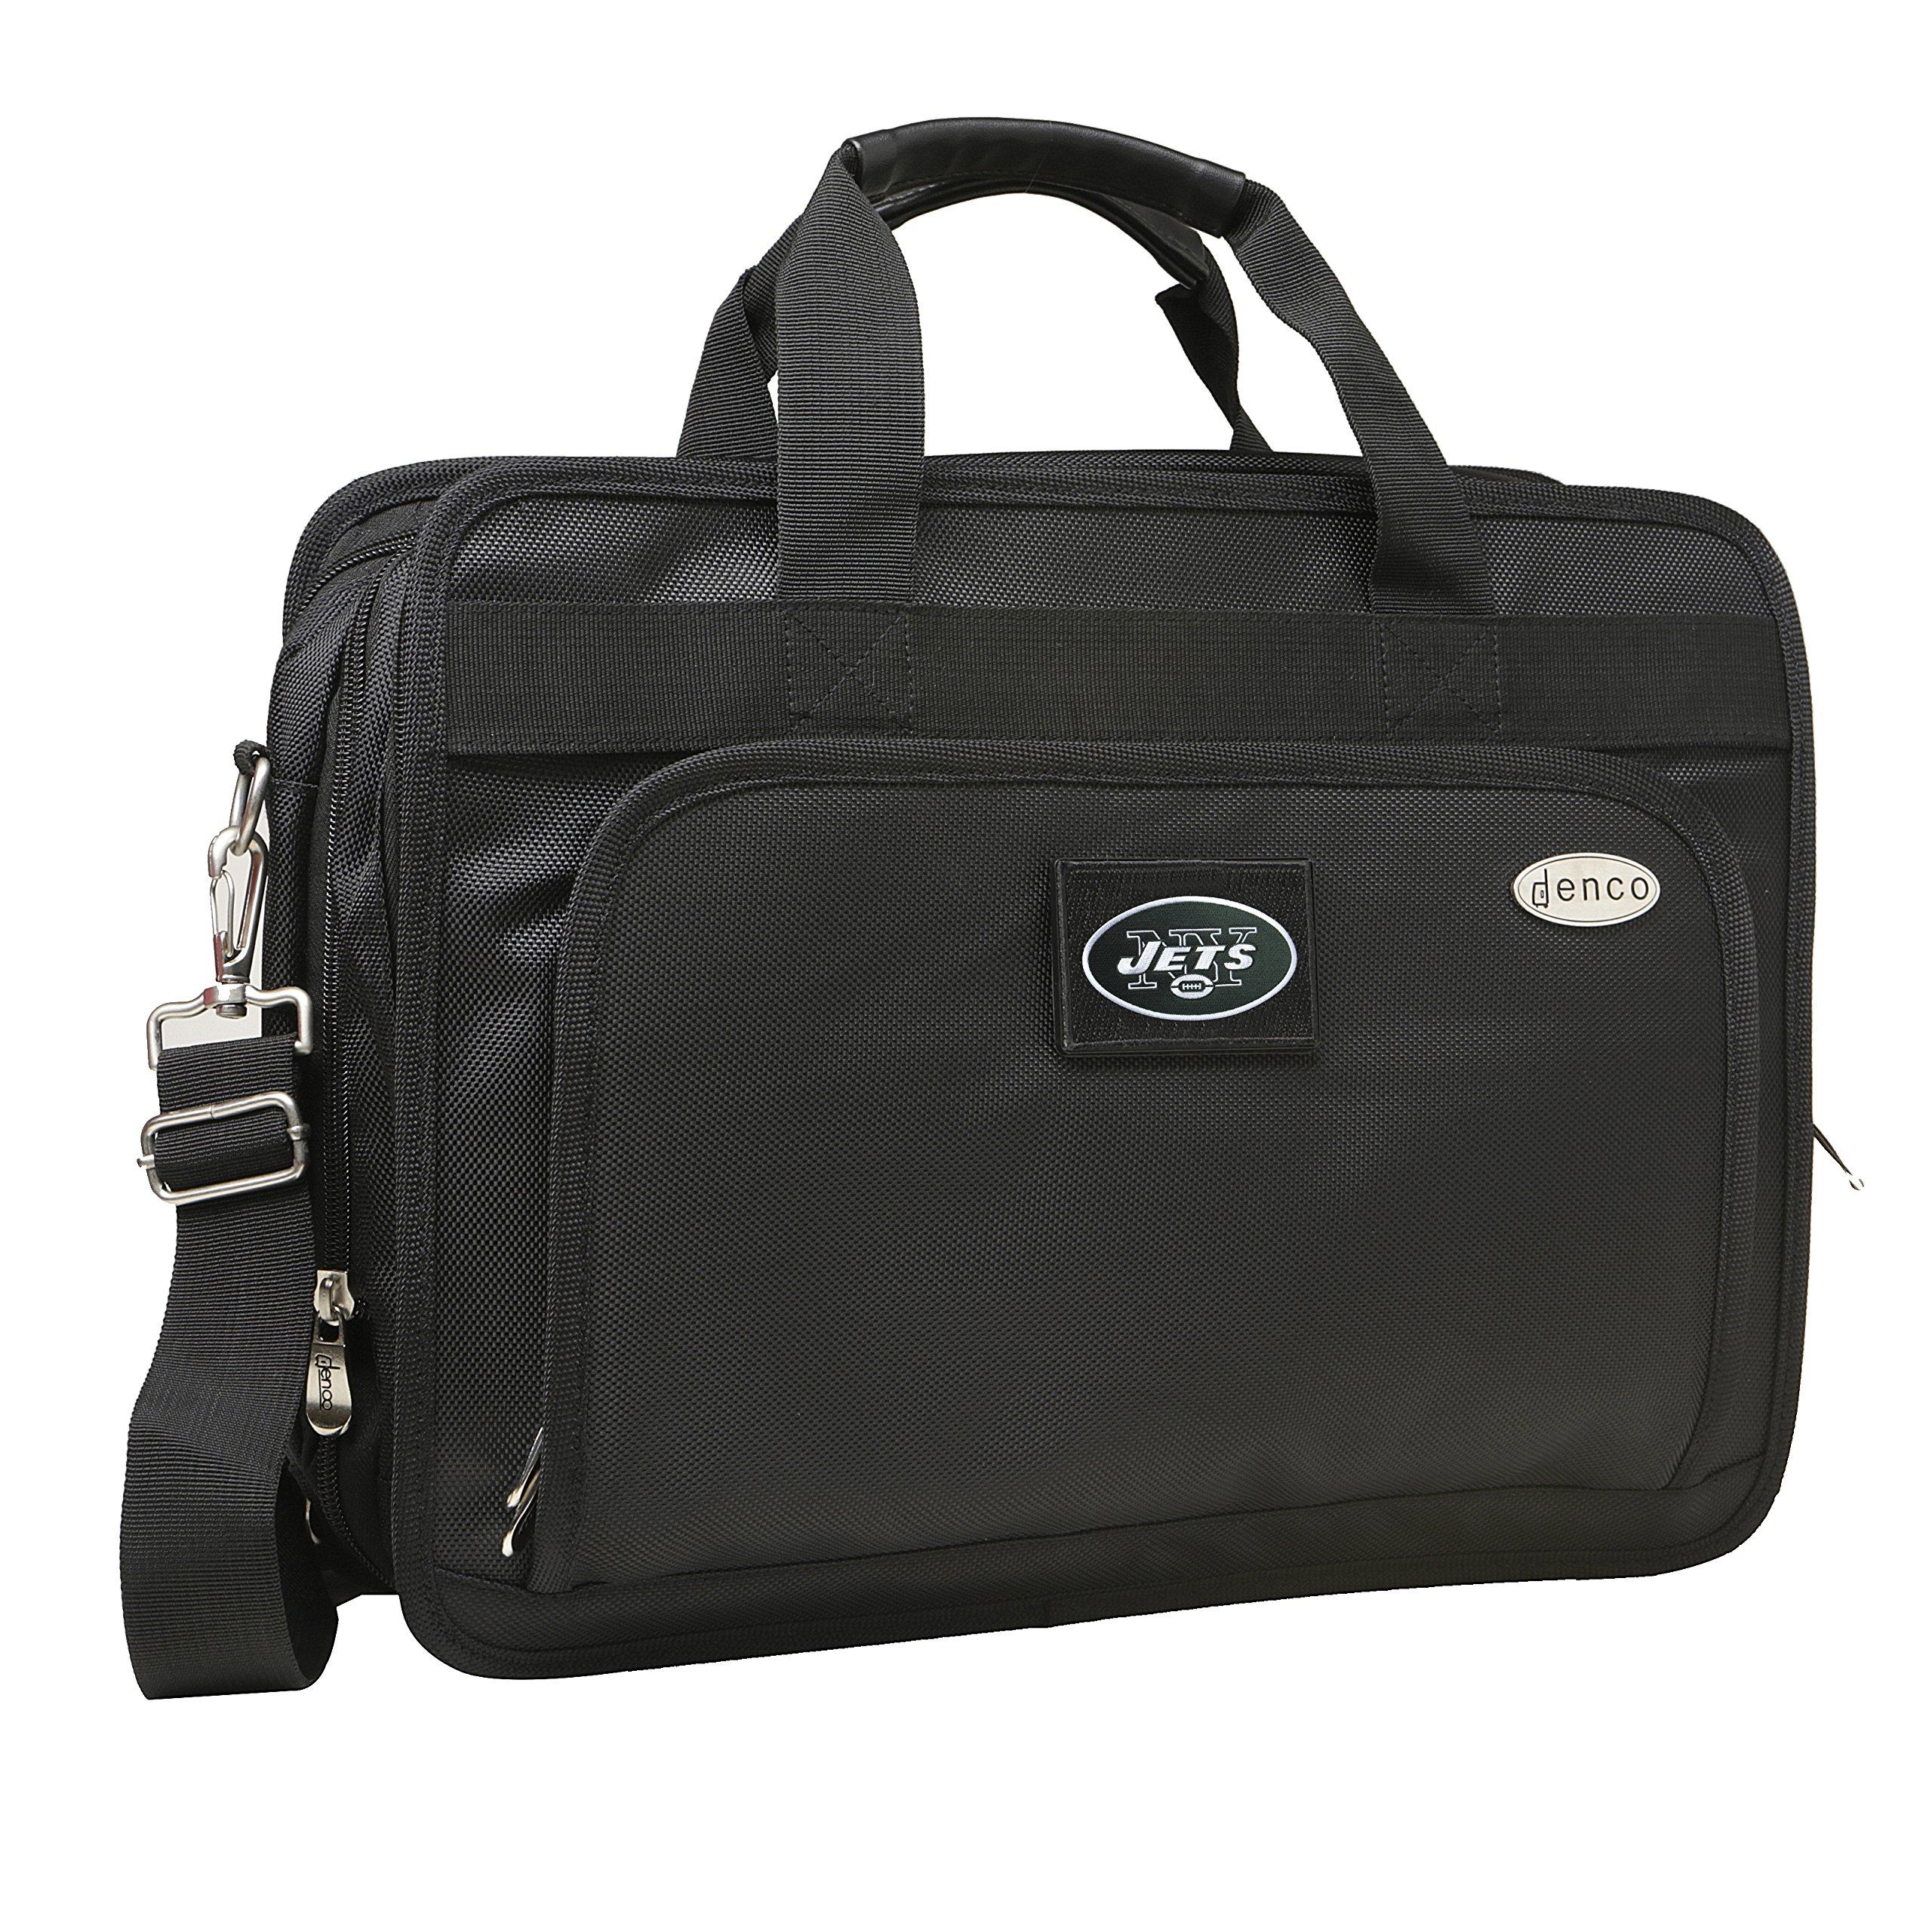 NFL New York Jets Expandable Laptop Briefcase, 13-Inch, Black